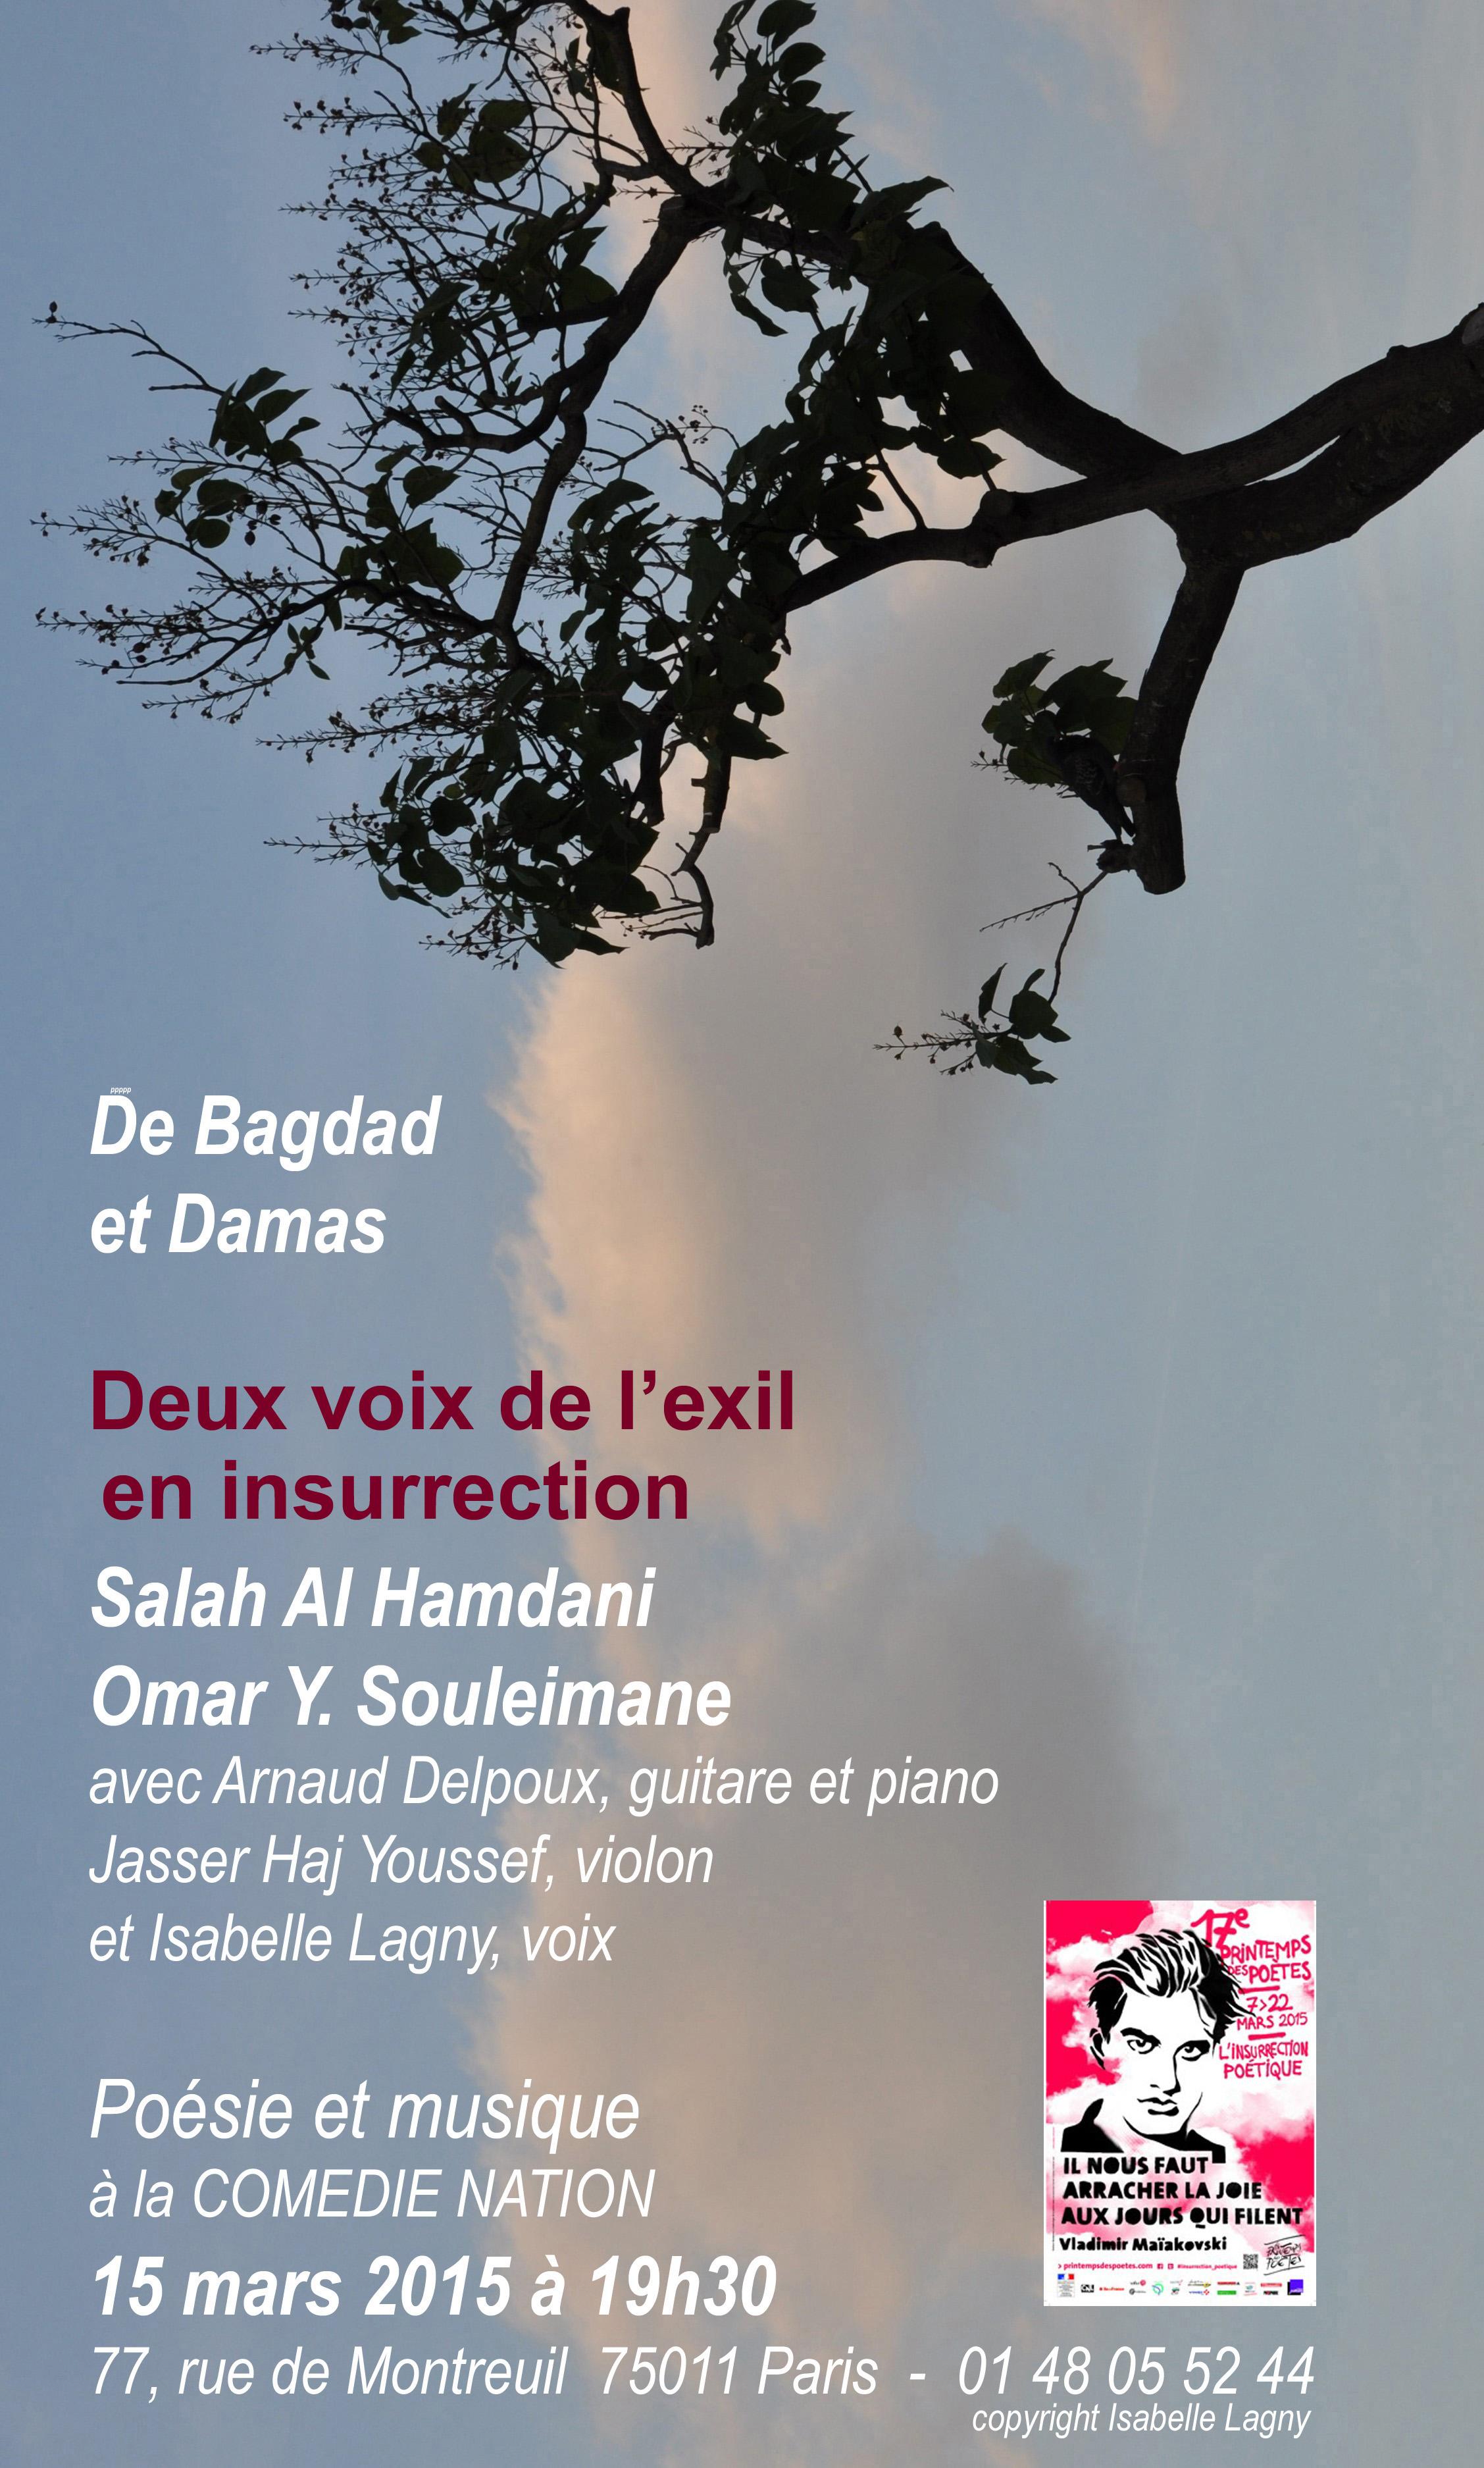 De Bagdad et Damas 2015